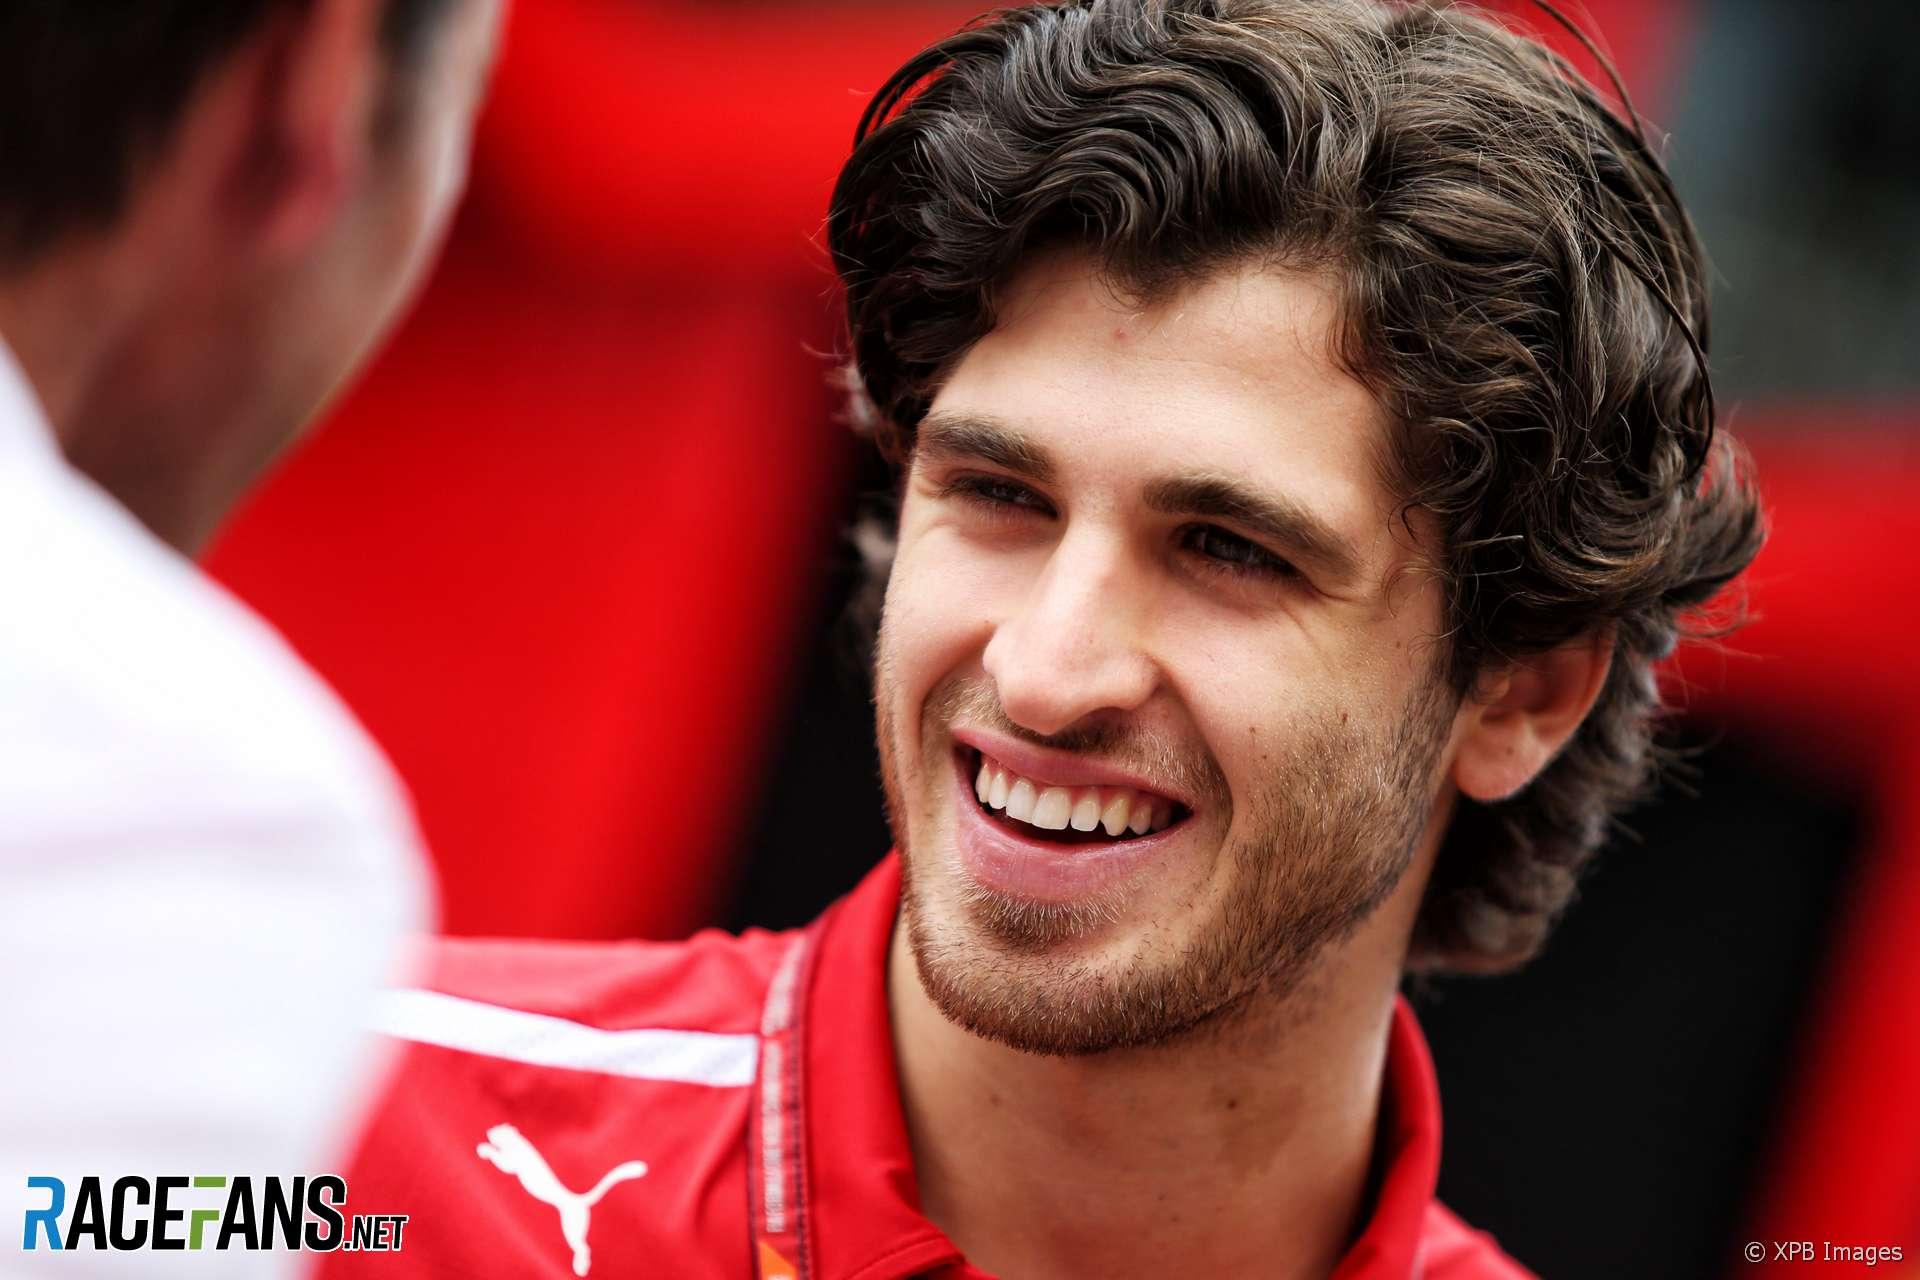 Antonio Giovinazzi, Ferrari, Hockenheimring, 2018